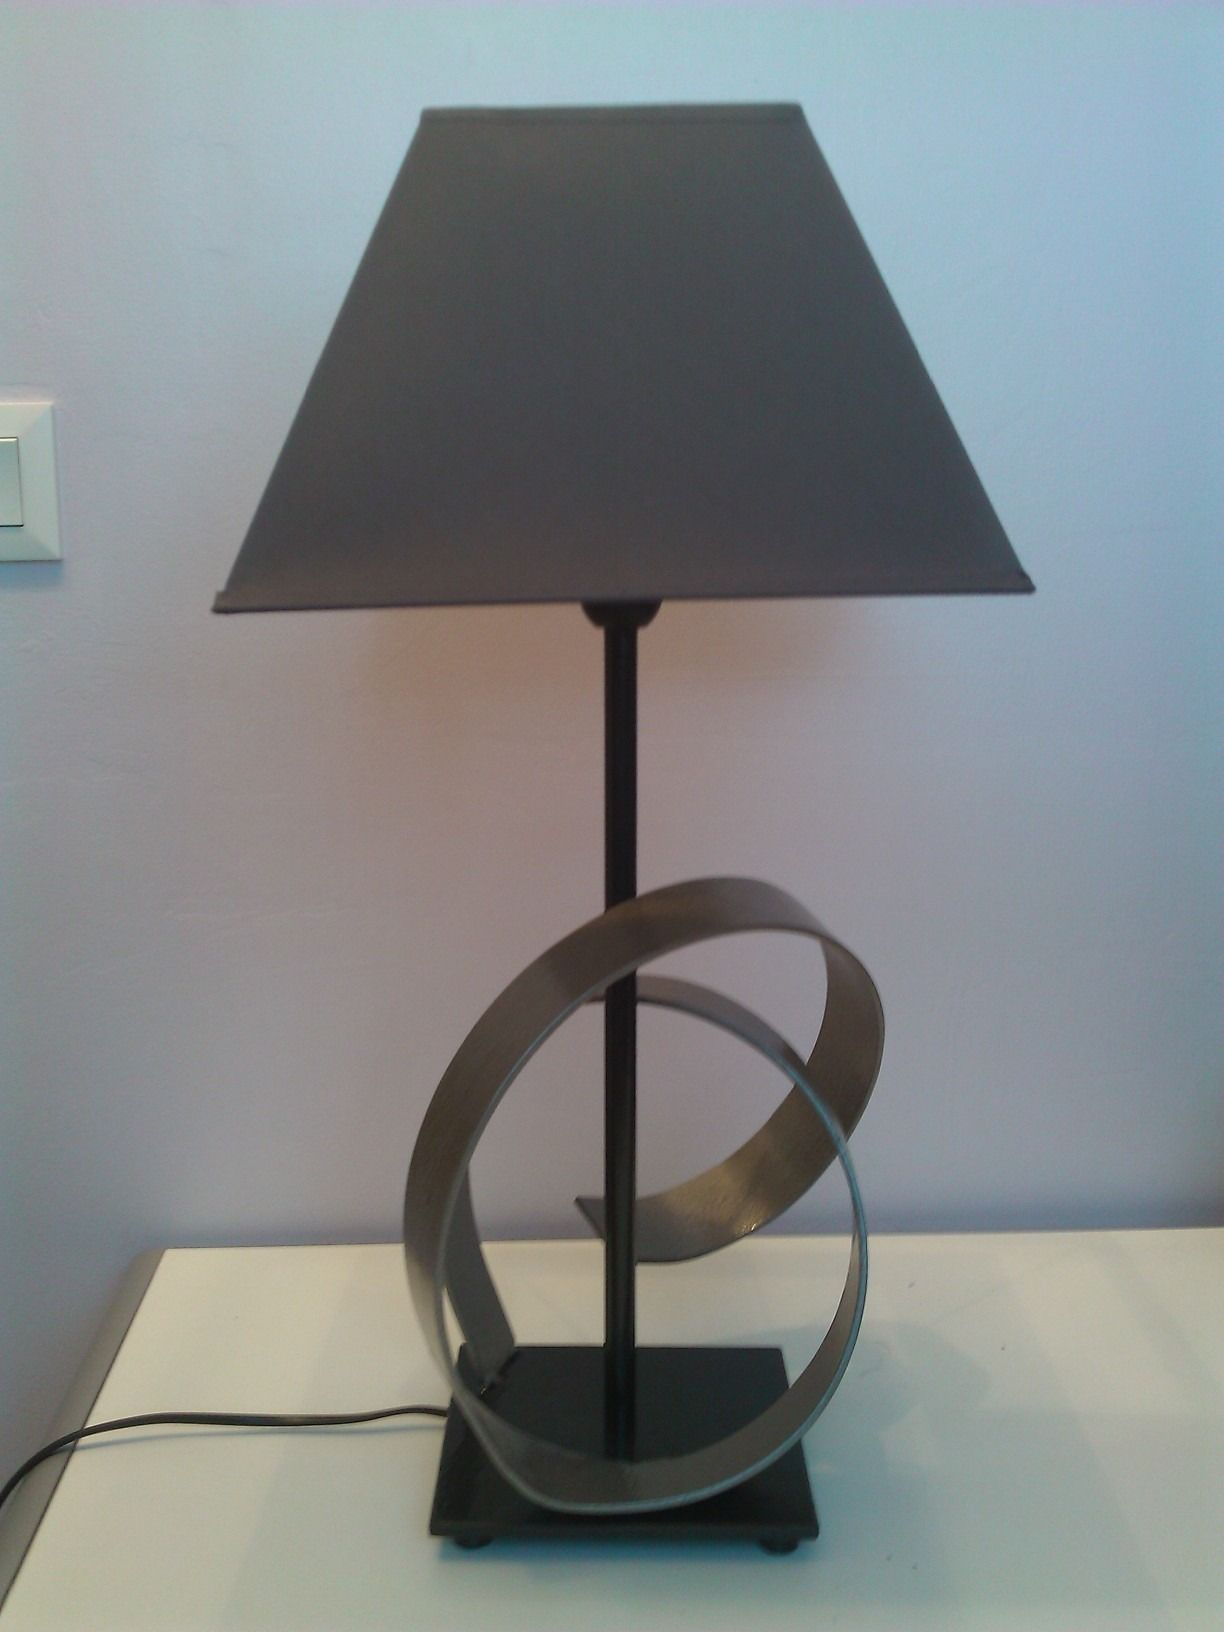 Lampe Fer Forge Design De Createur Plus Lampe Fer Forge Fer